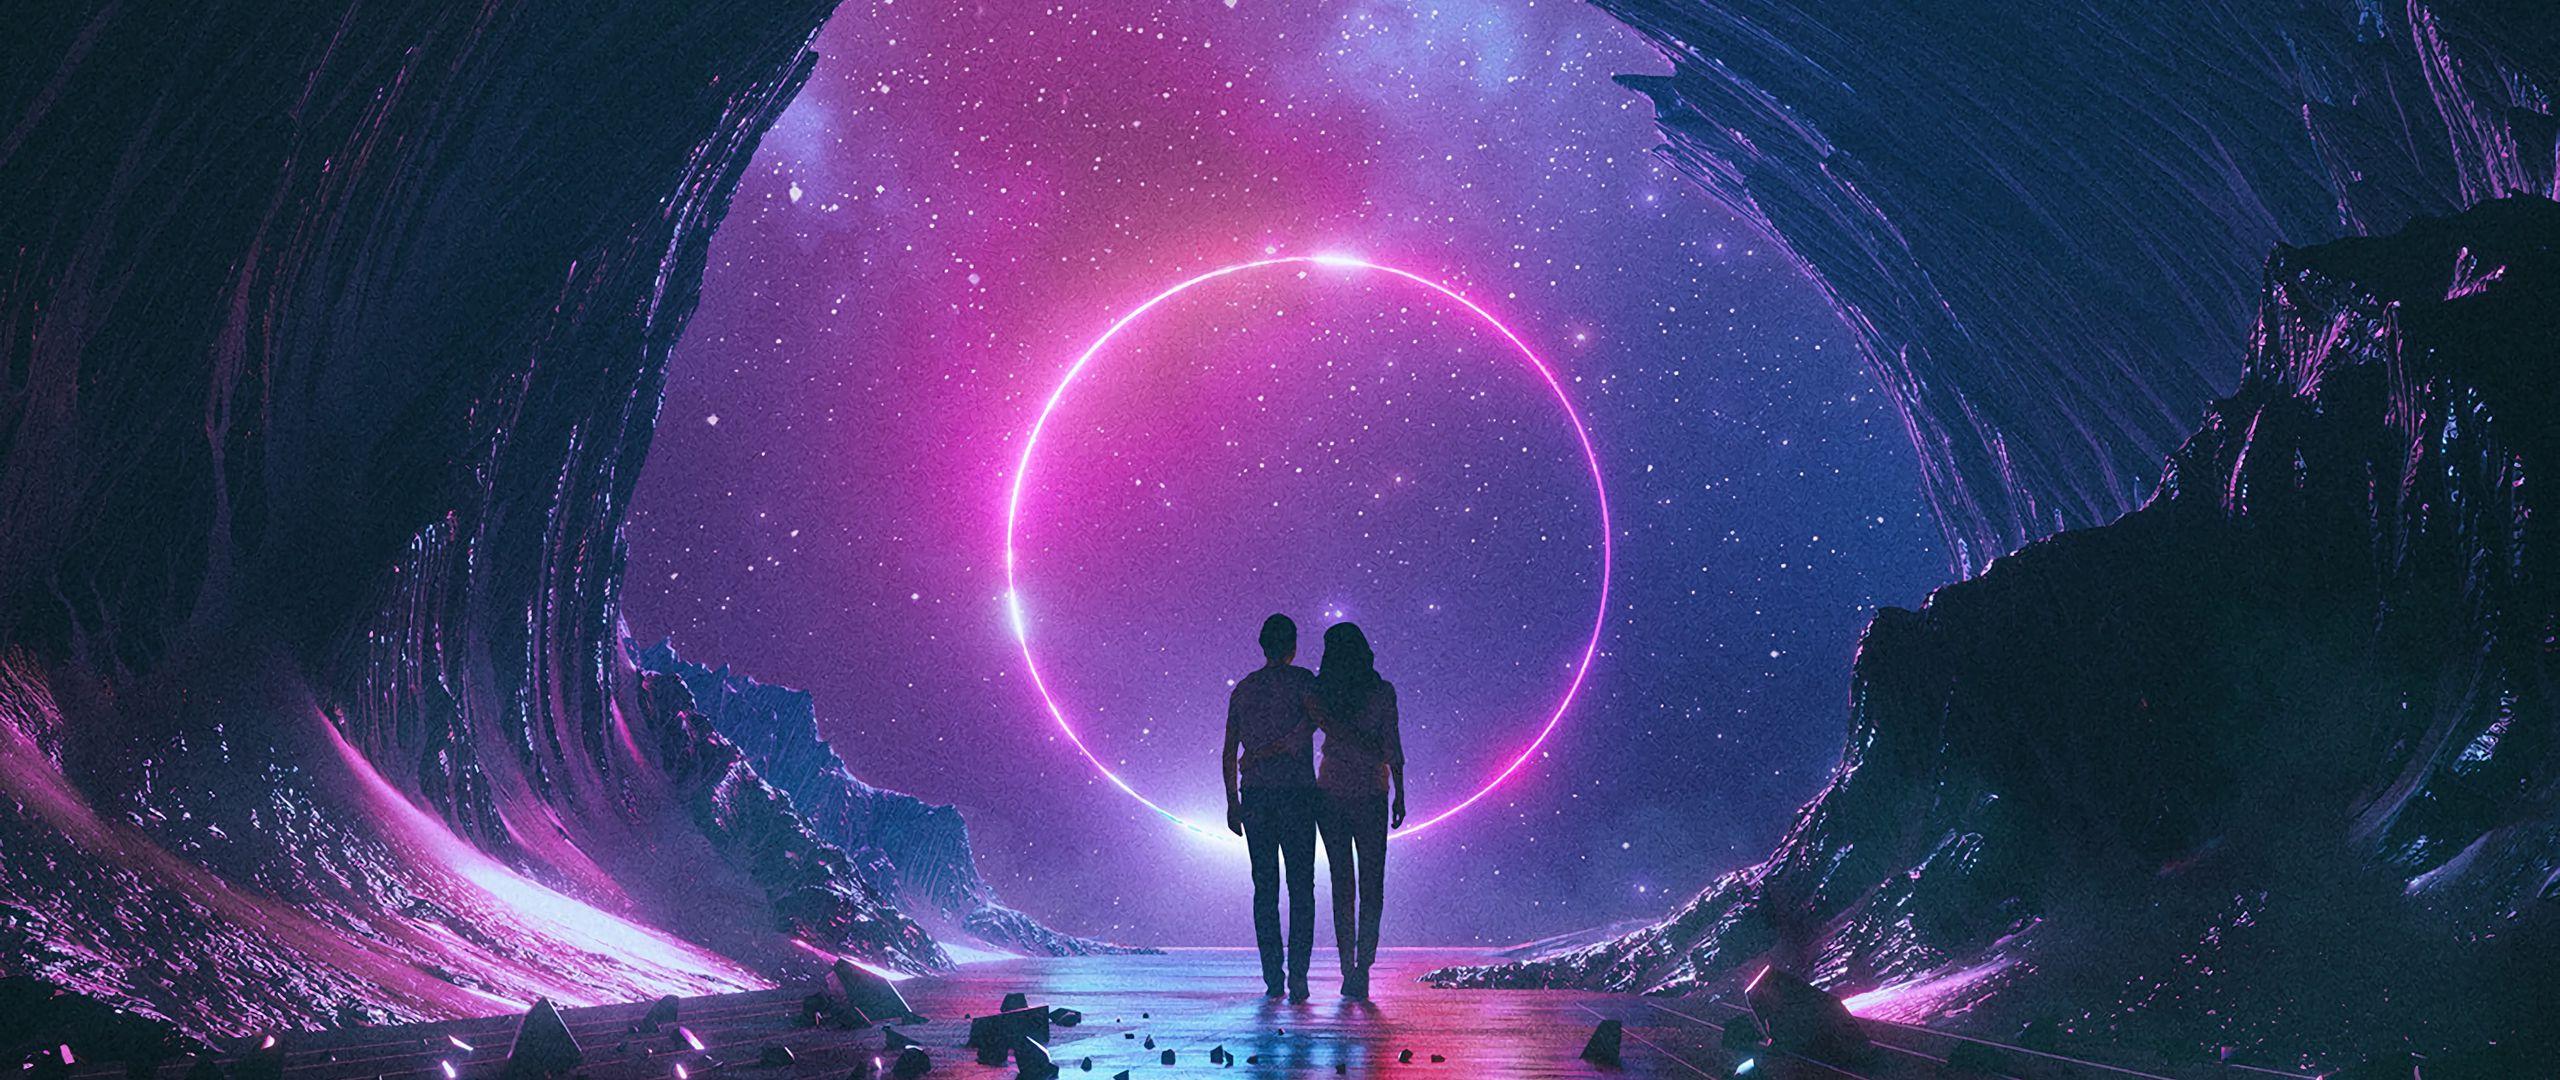 2560x1080 Wallpaper couple, starry sky, art, space, hugs